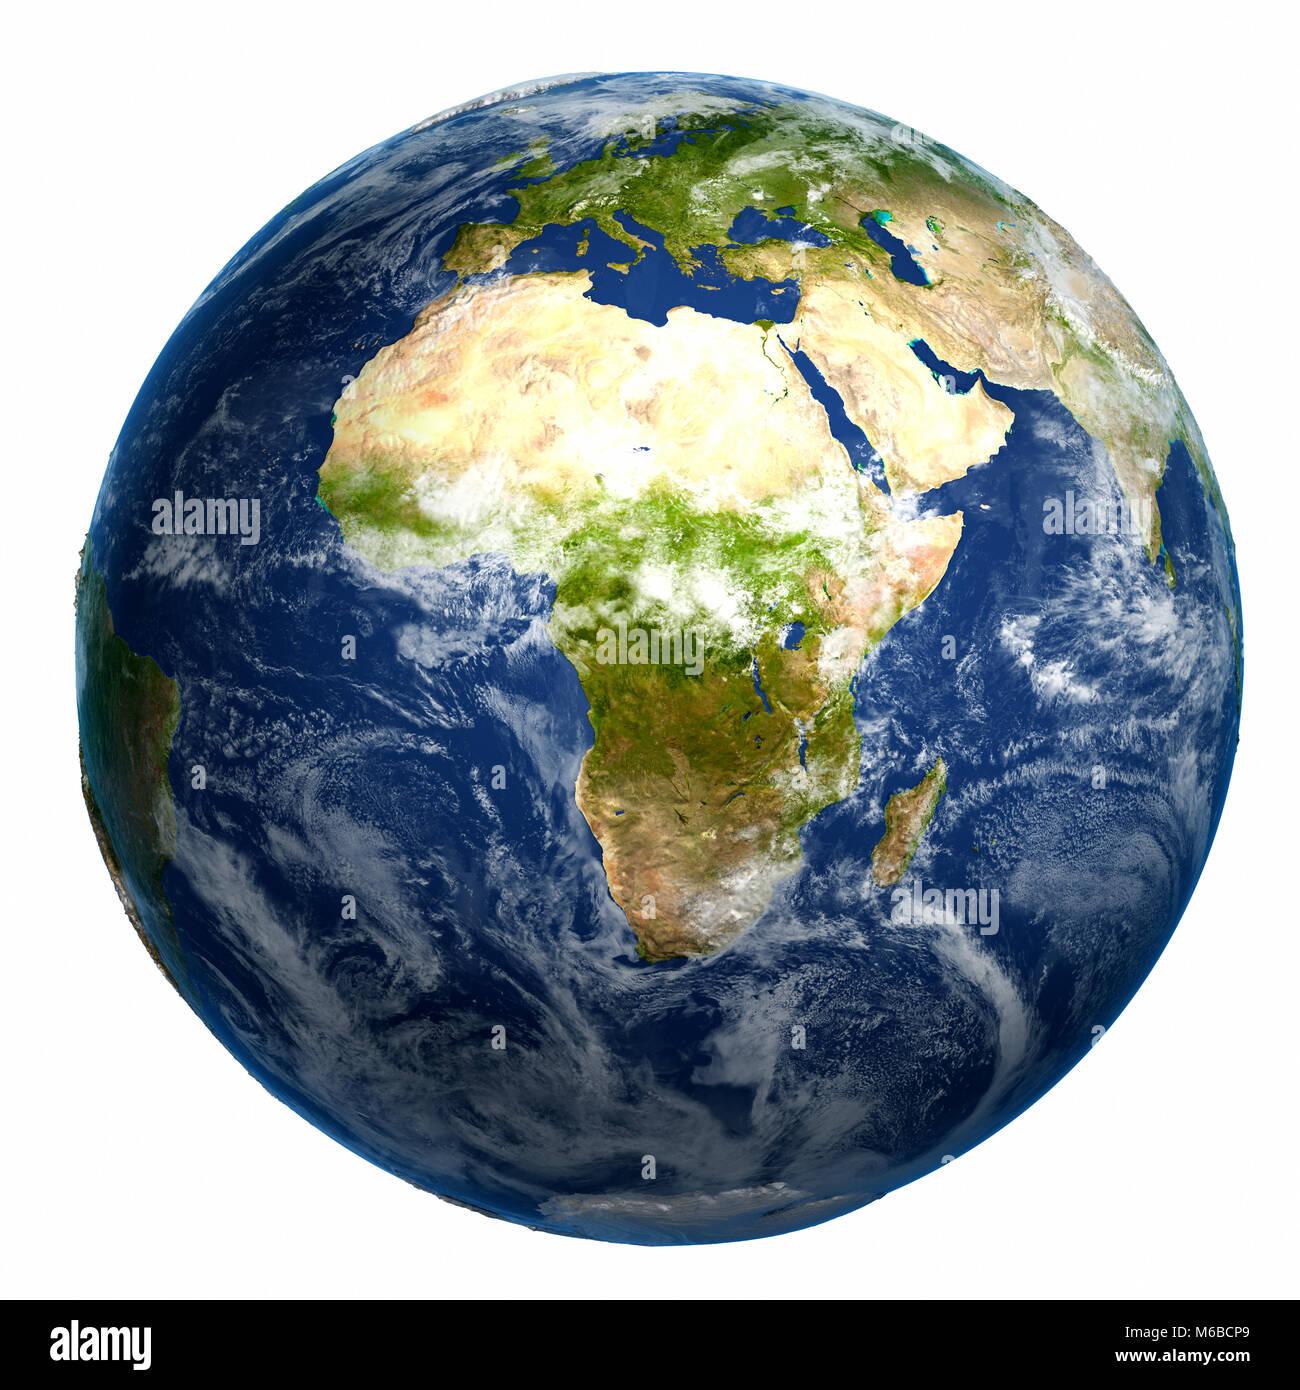 Earth Globe Map 3d Rendering Stock Photo 176043121 Alamy